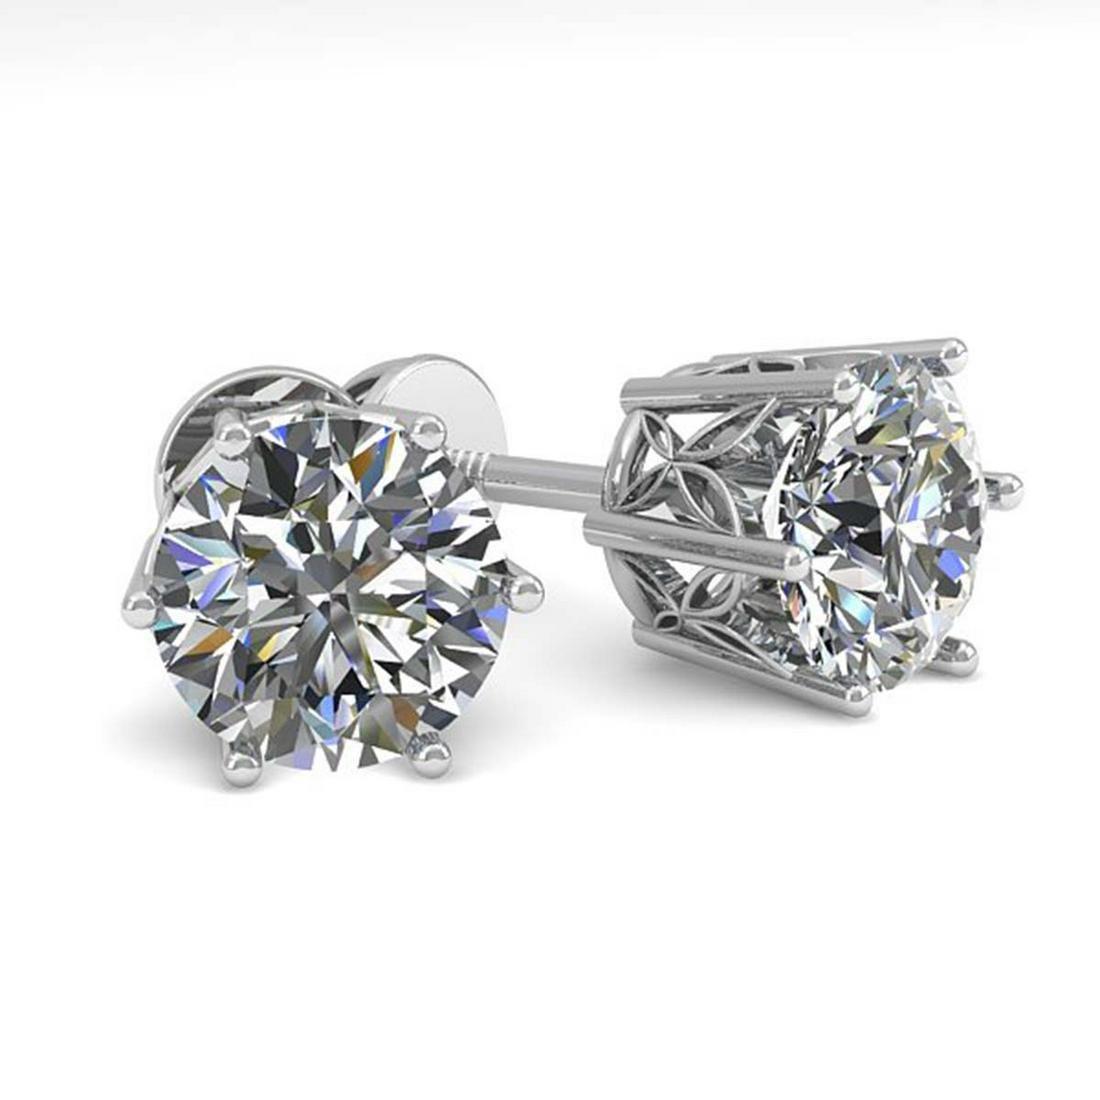 2.03 ctw VS/SI Diamond Stud Art Deco Earrings 14K White